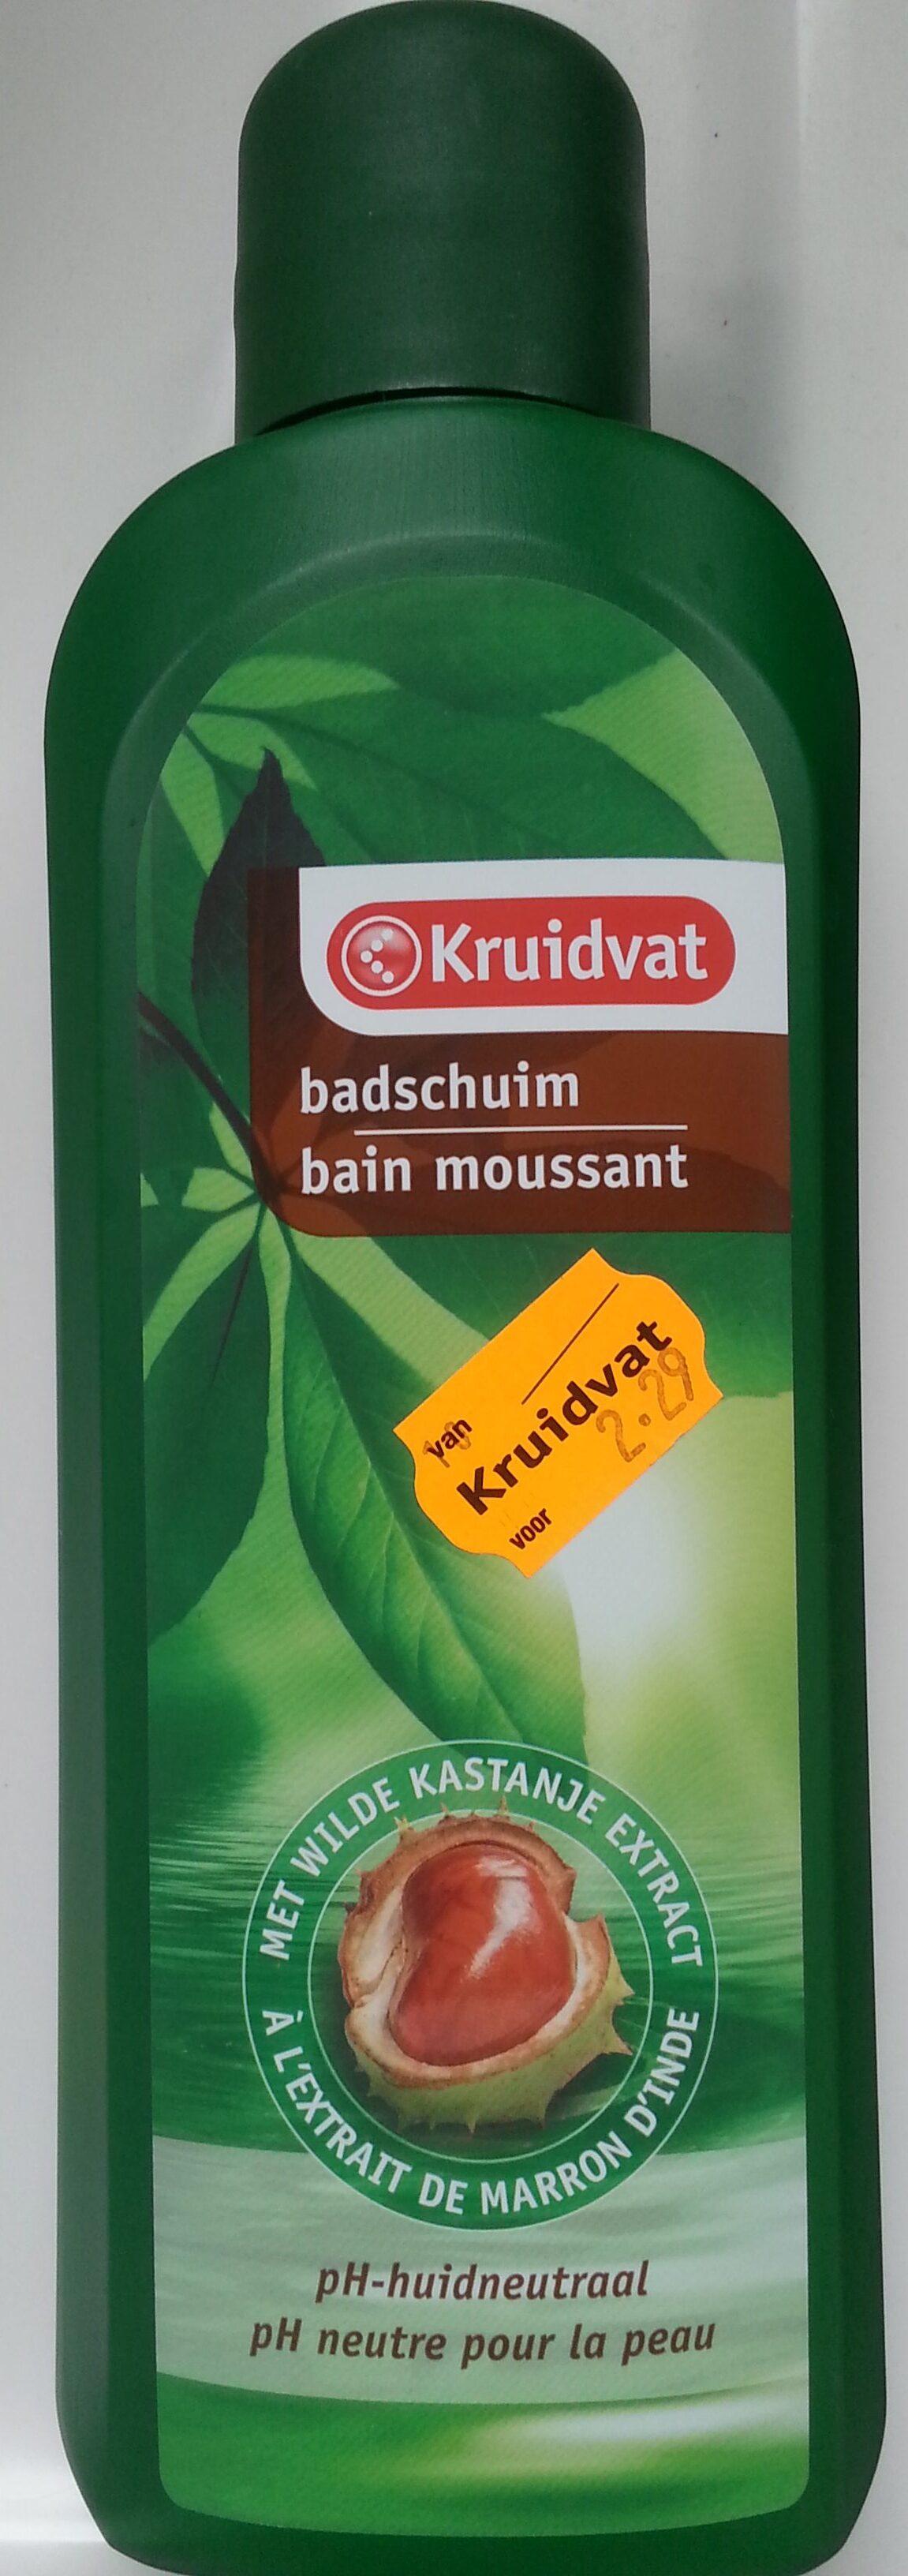 Badschuim - Product - nl